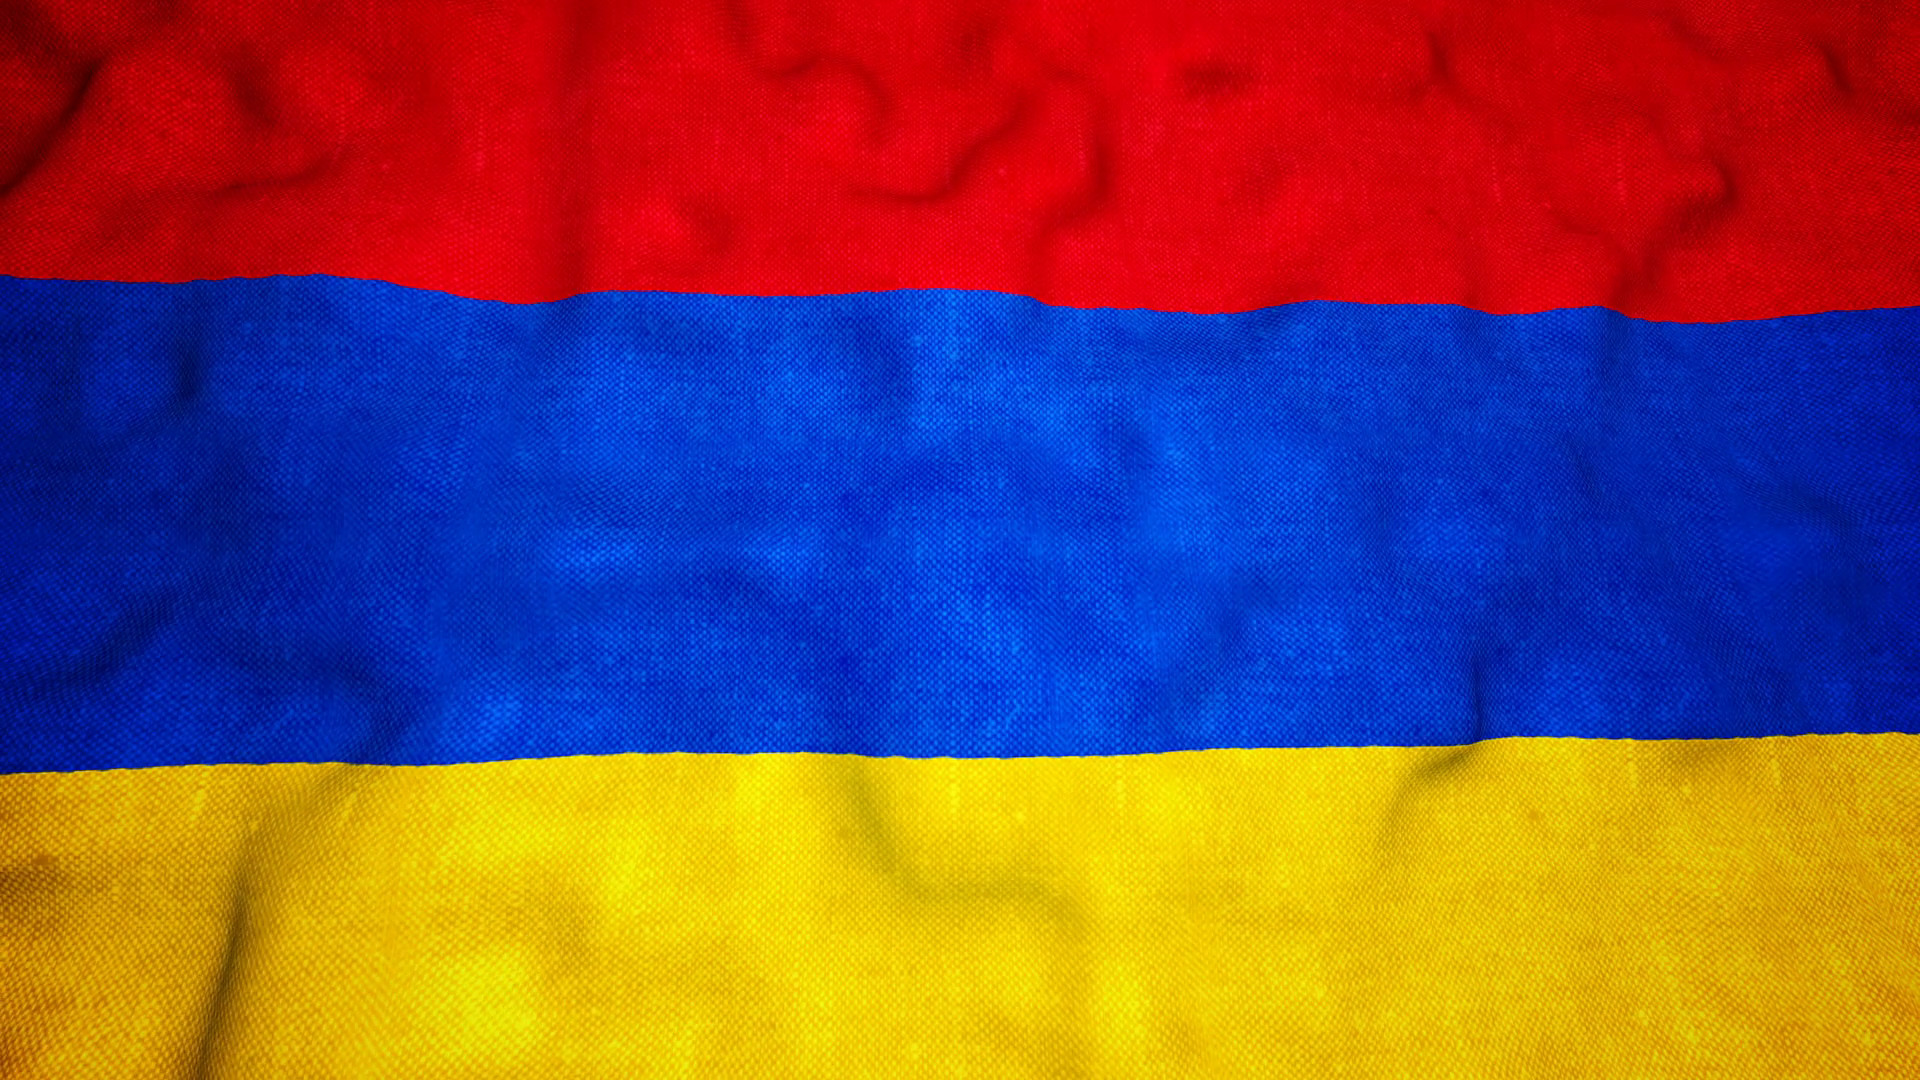 Armenian Flag Seamless Video Loop Motion Background - Videoblocks